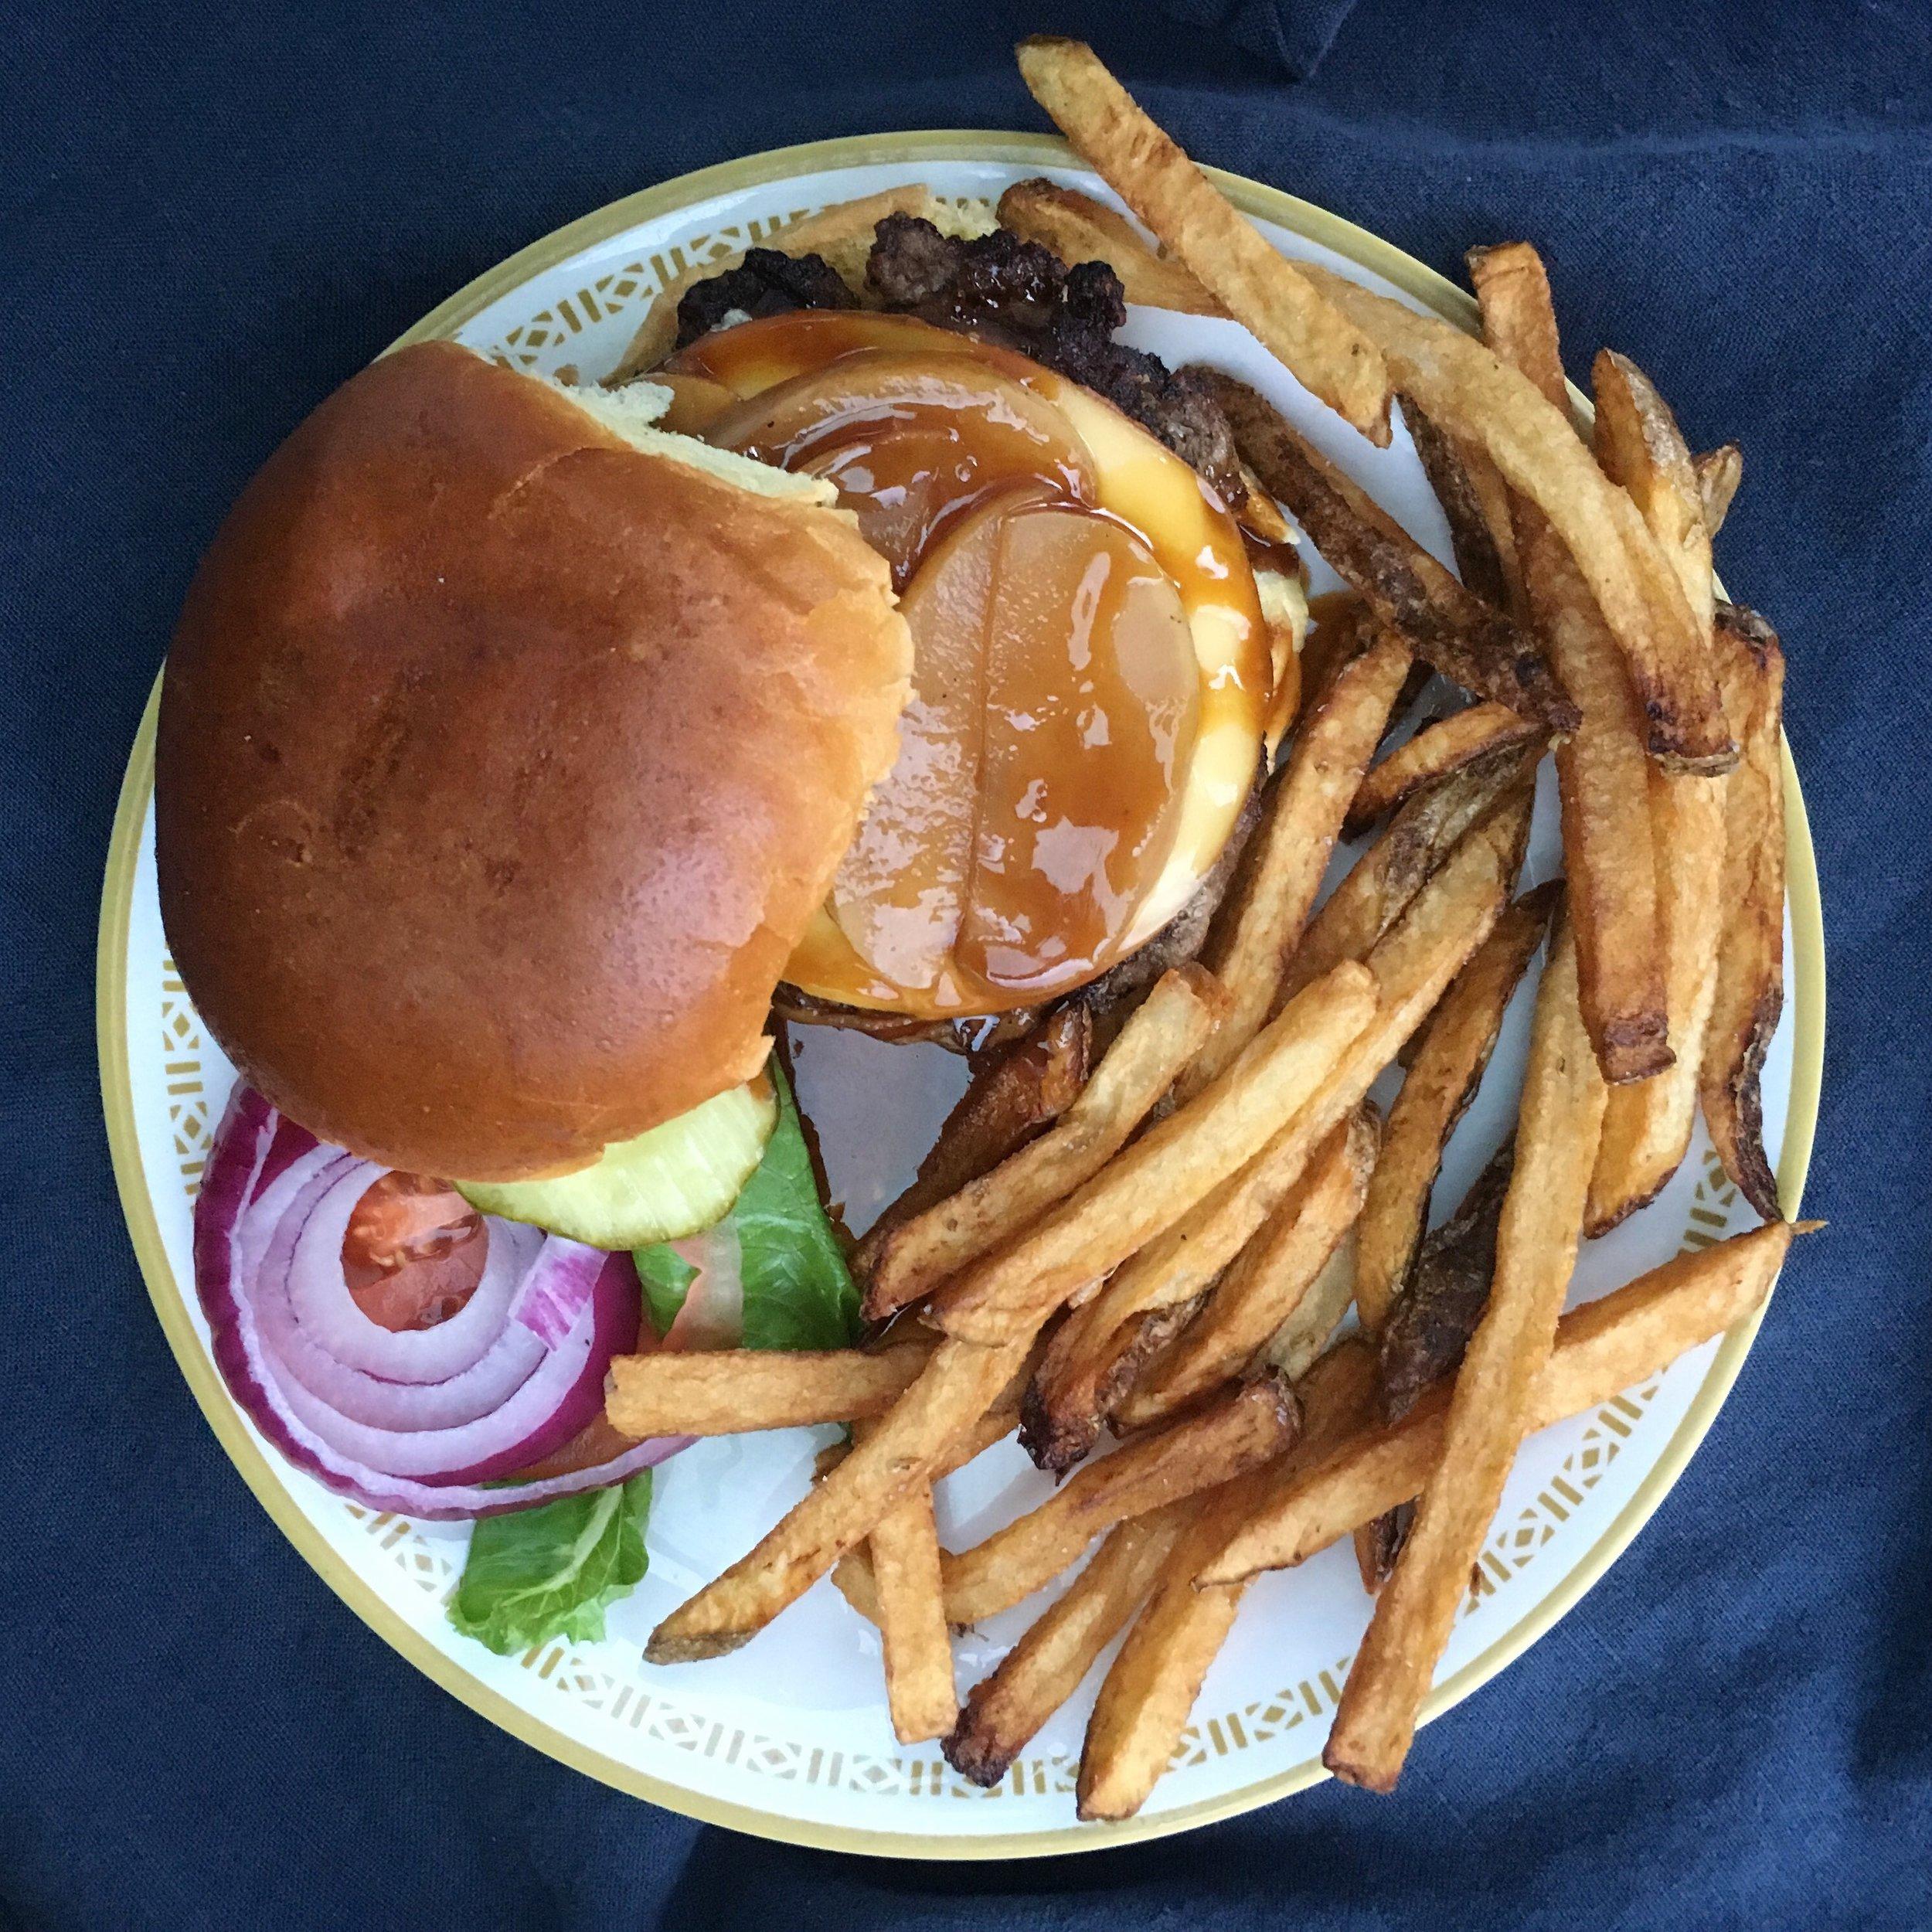 On a burger!